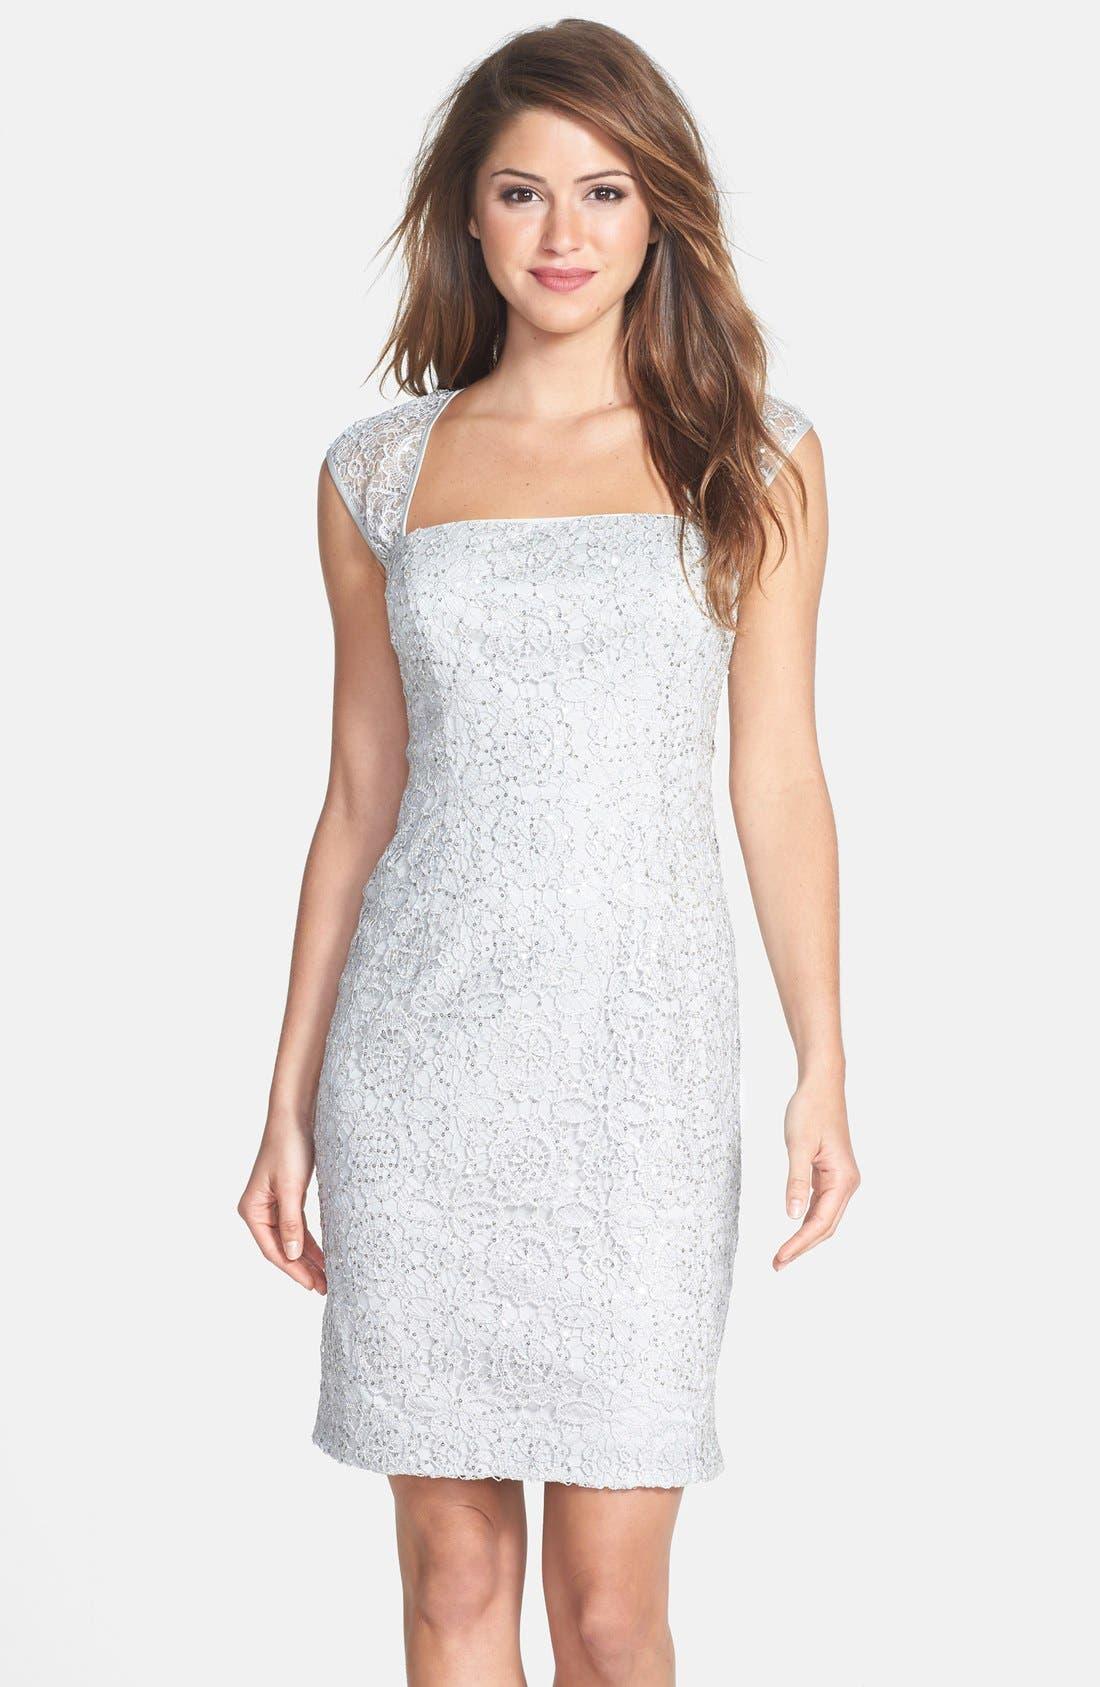 Alternate Image 1 Selected - Adrianna Papell Sequin Lace Sheath Dress (Regular & Petite)